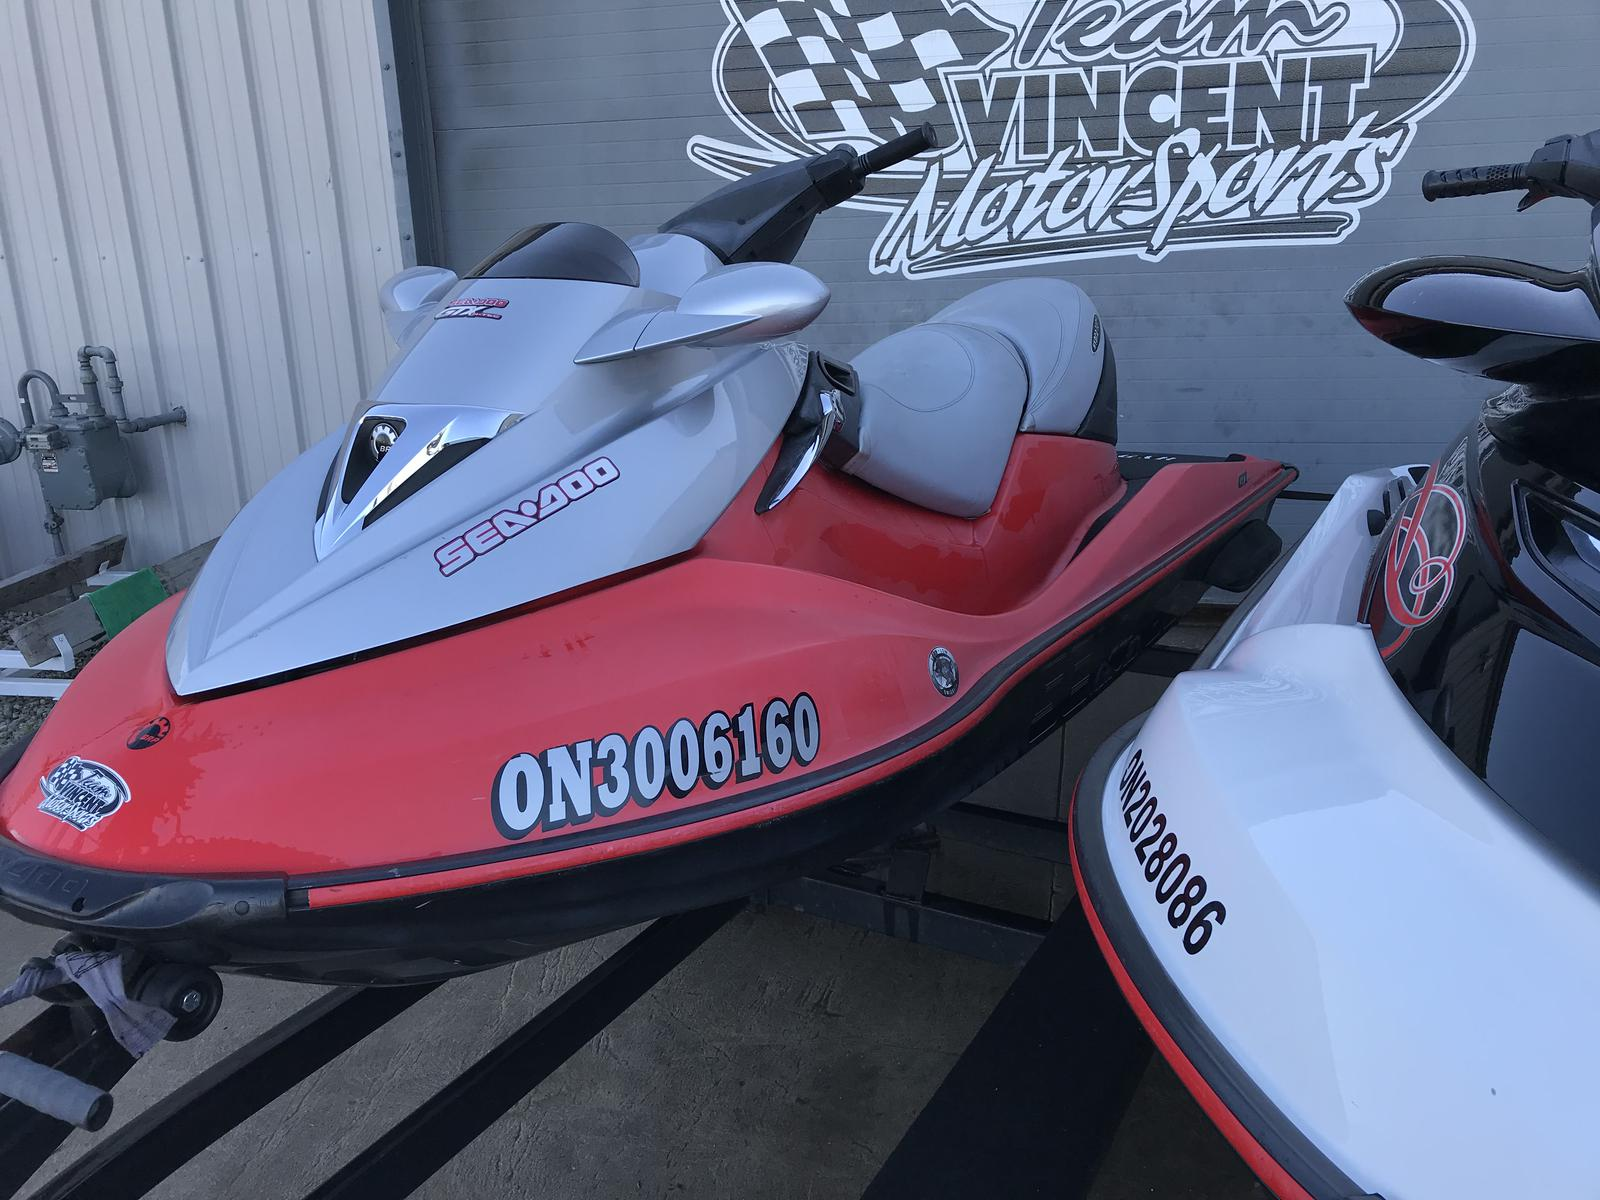 For Sale: 2003 Sea Doo Pwc Gtx 185 S/c ft<br/>Team Vincent Motorsports Inc